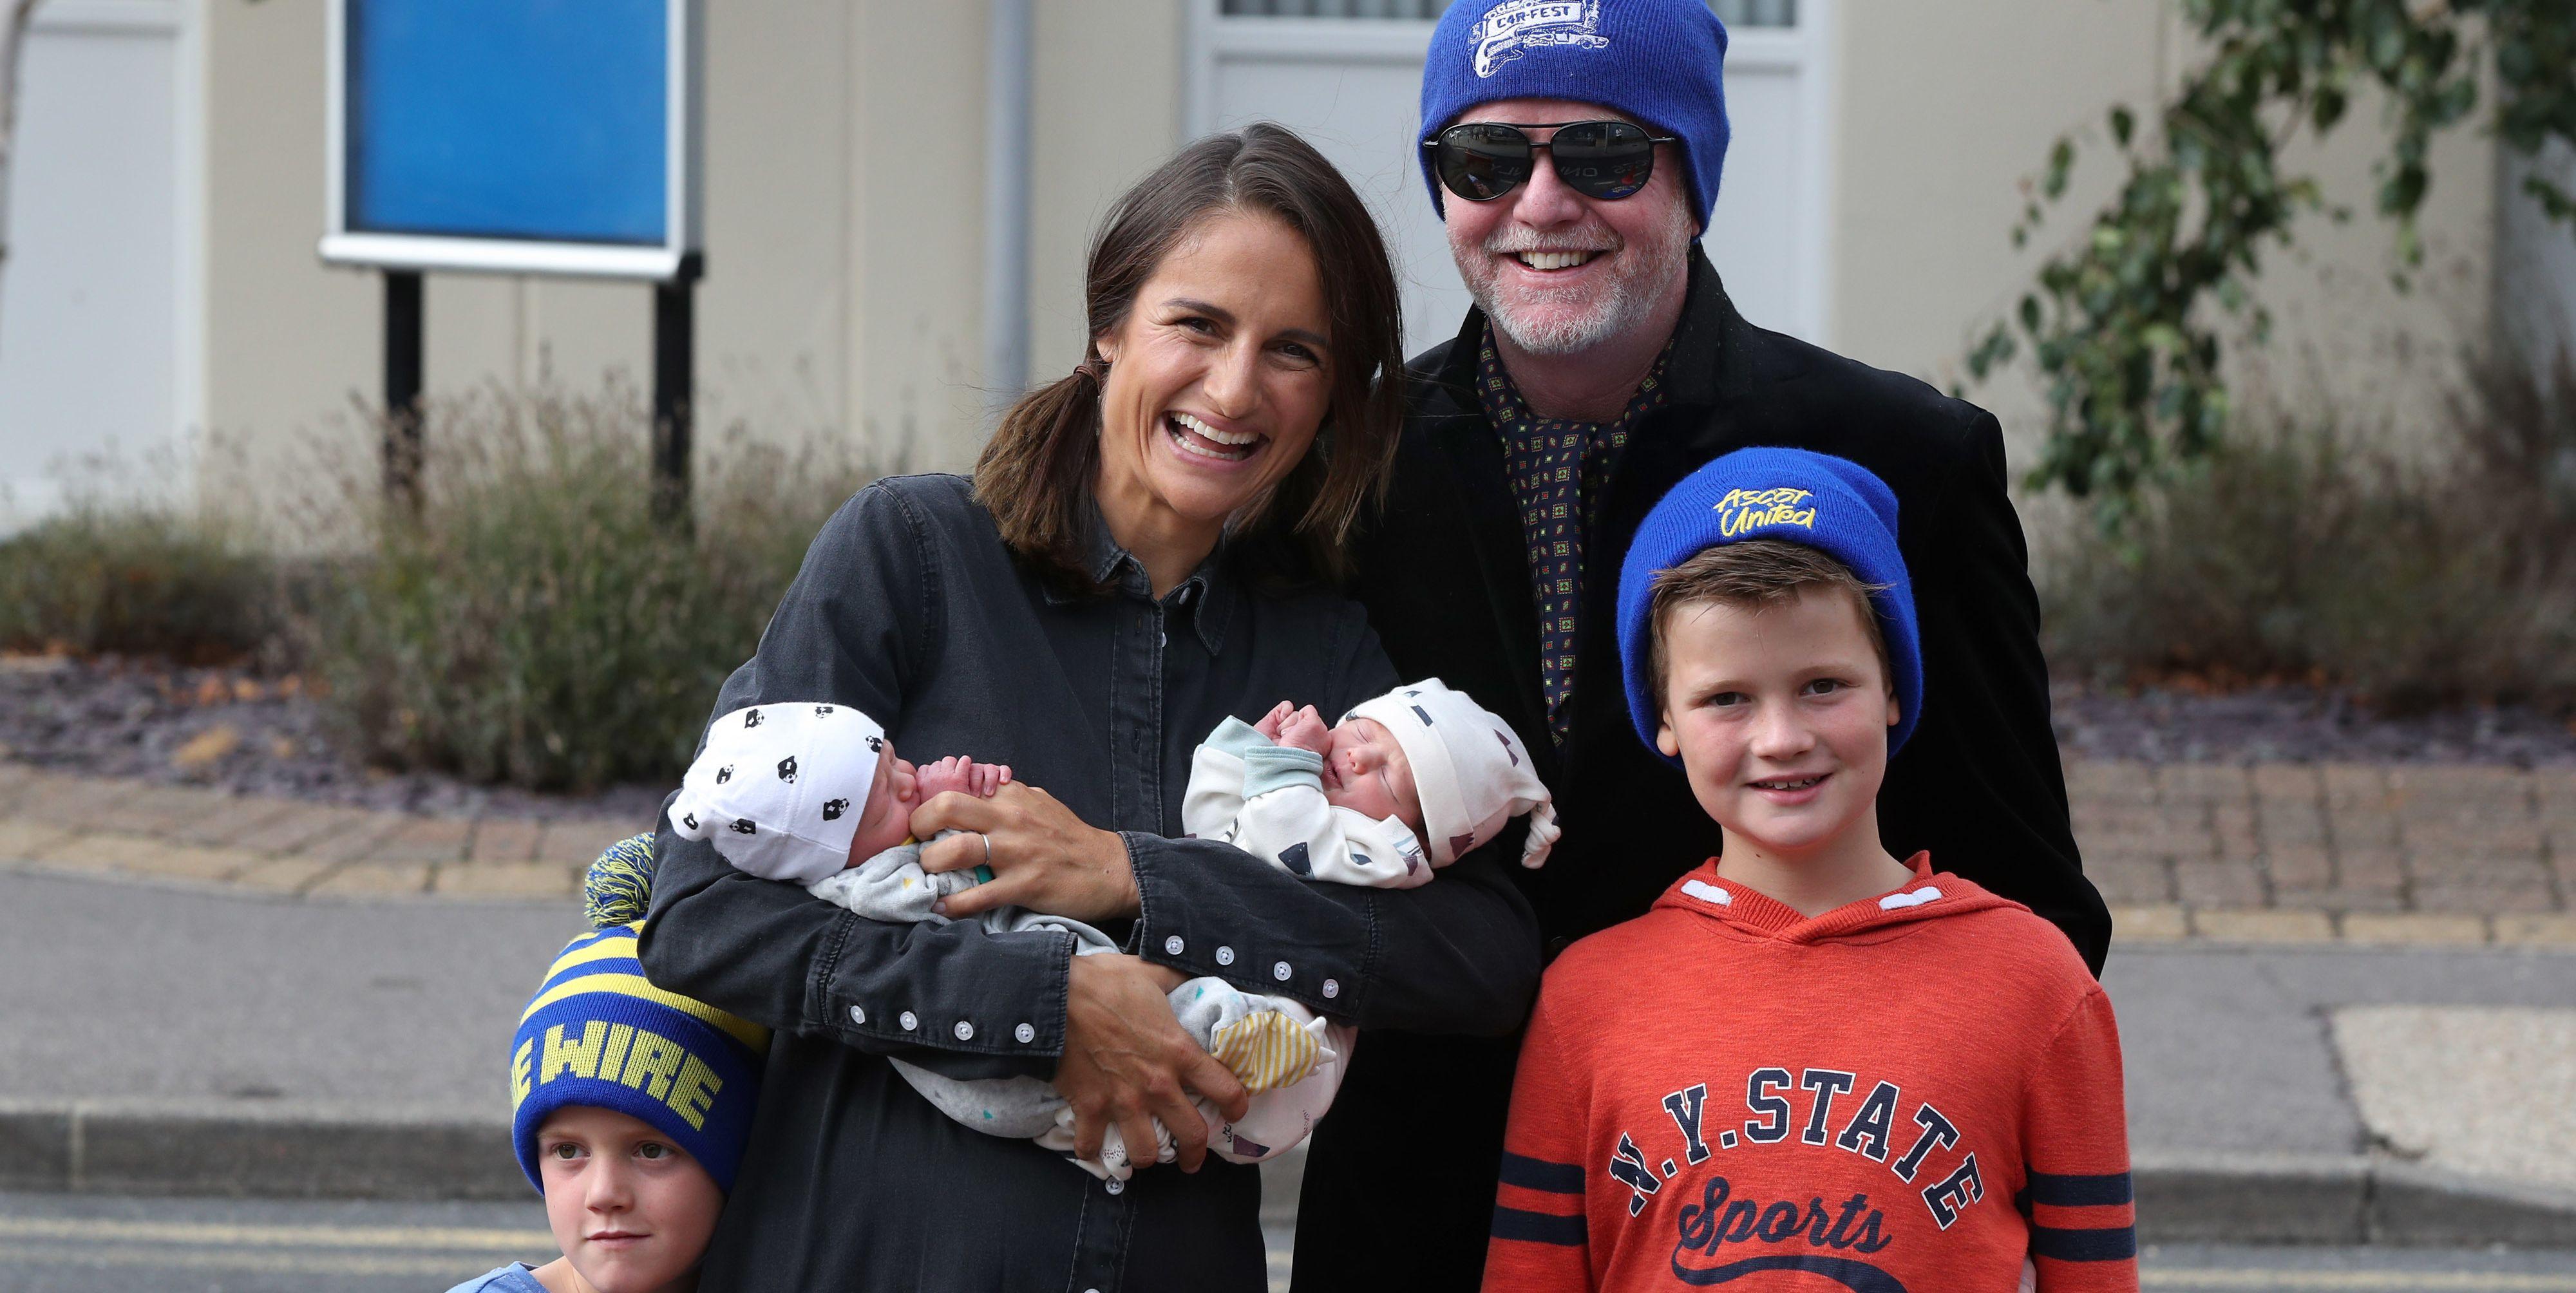 Chris Evans reveals twins baby names